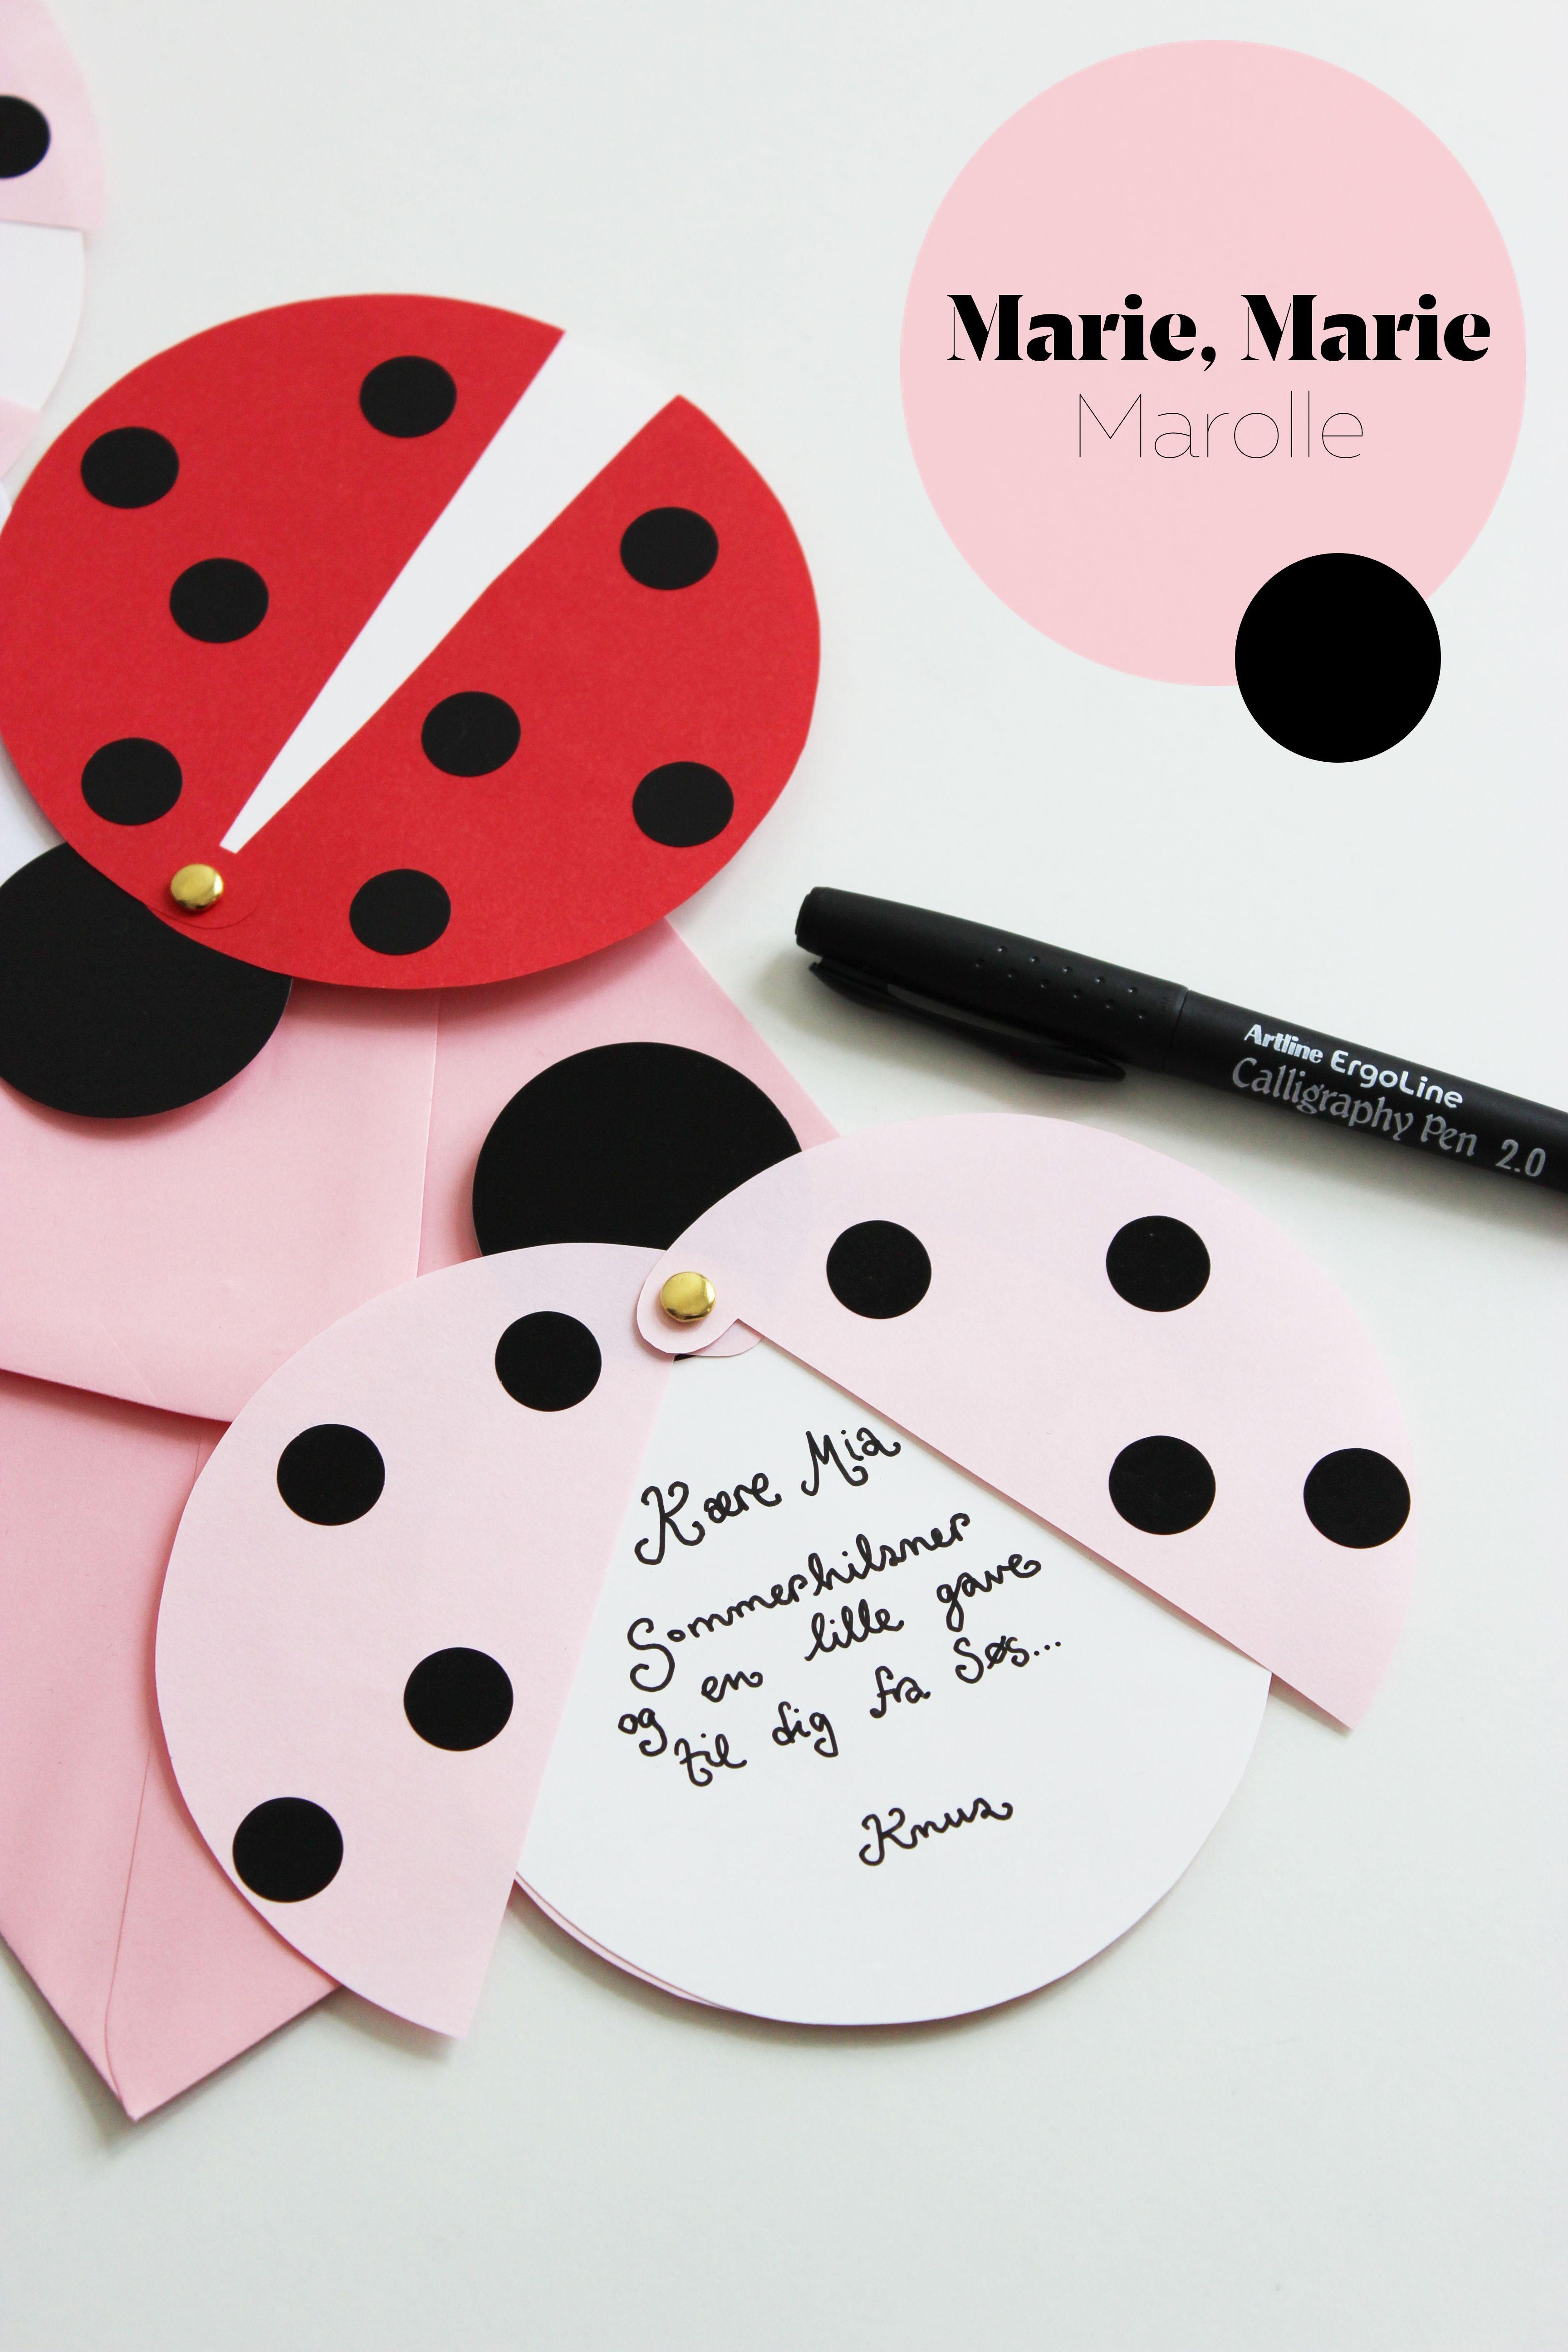 Diy: Ladybug Party Invitations (Free Printable Template) | Diy - Free Printable Ladybug Invitations